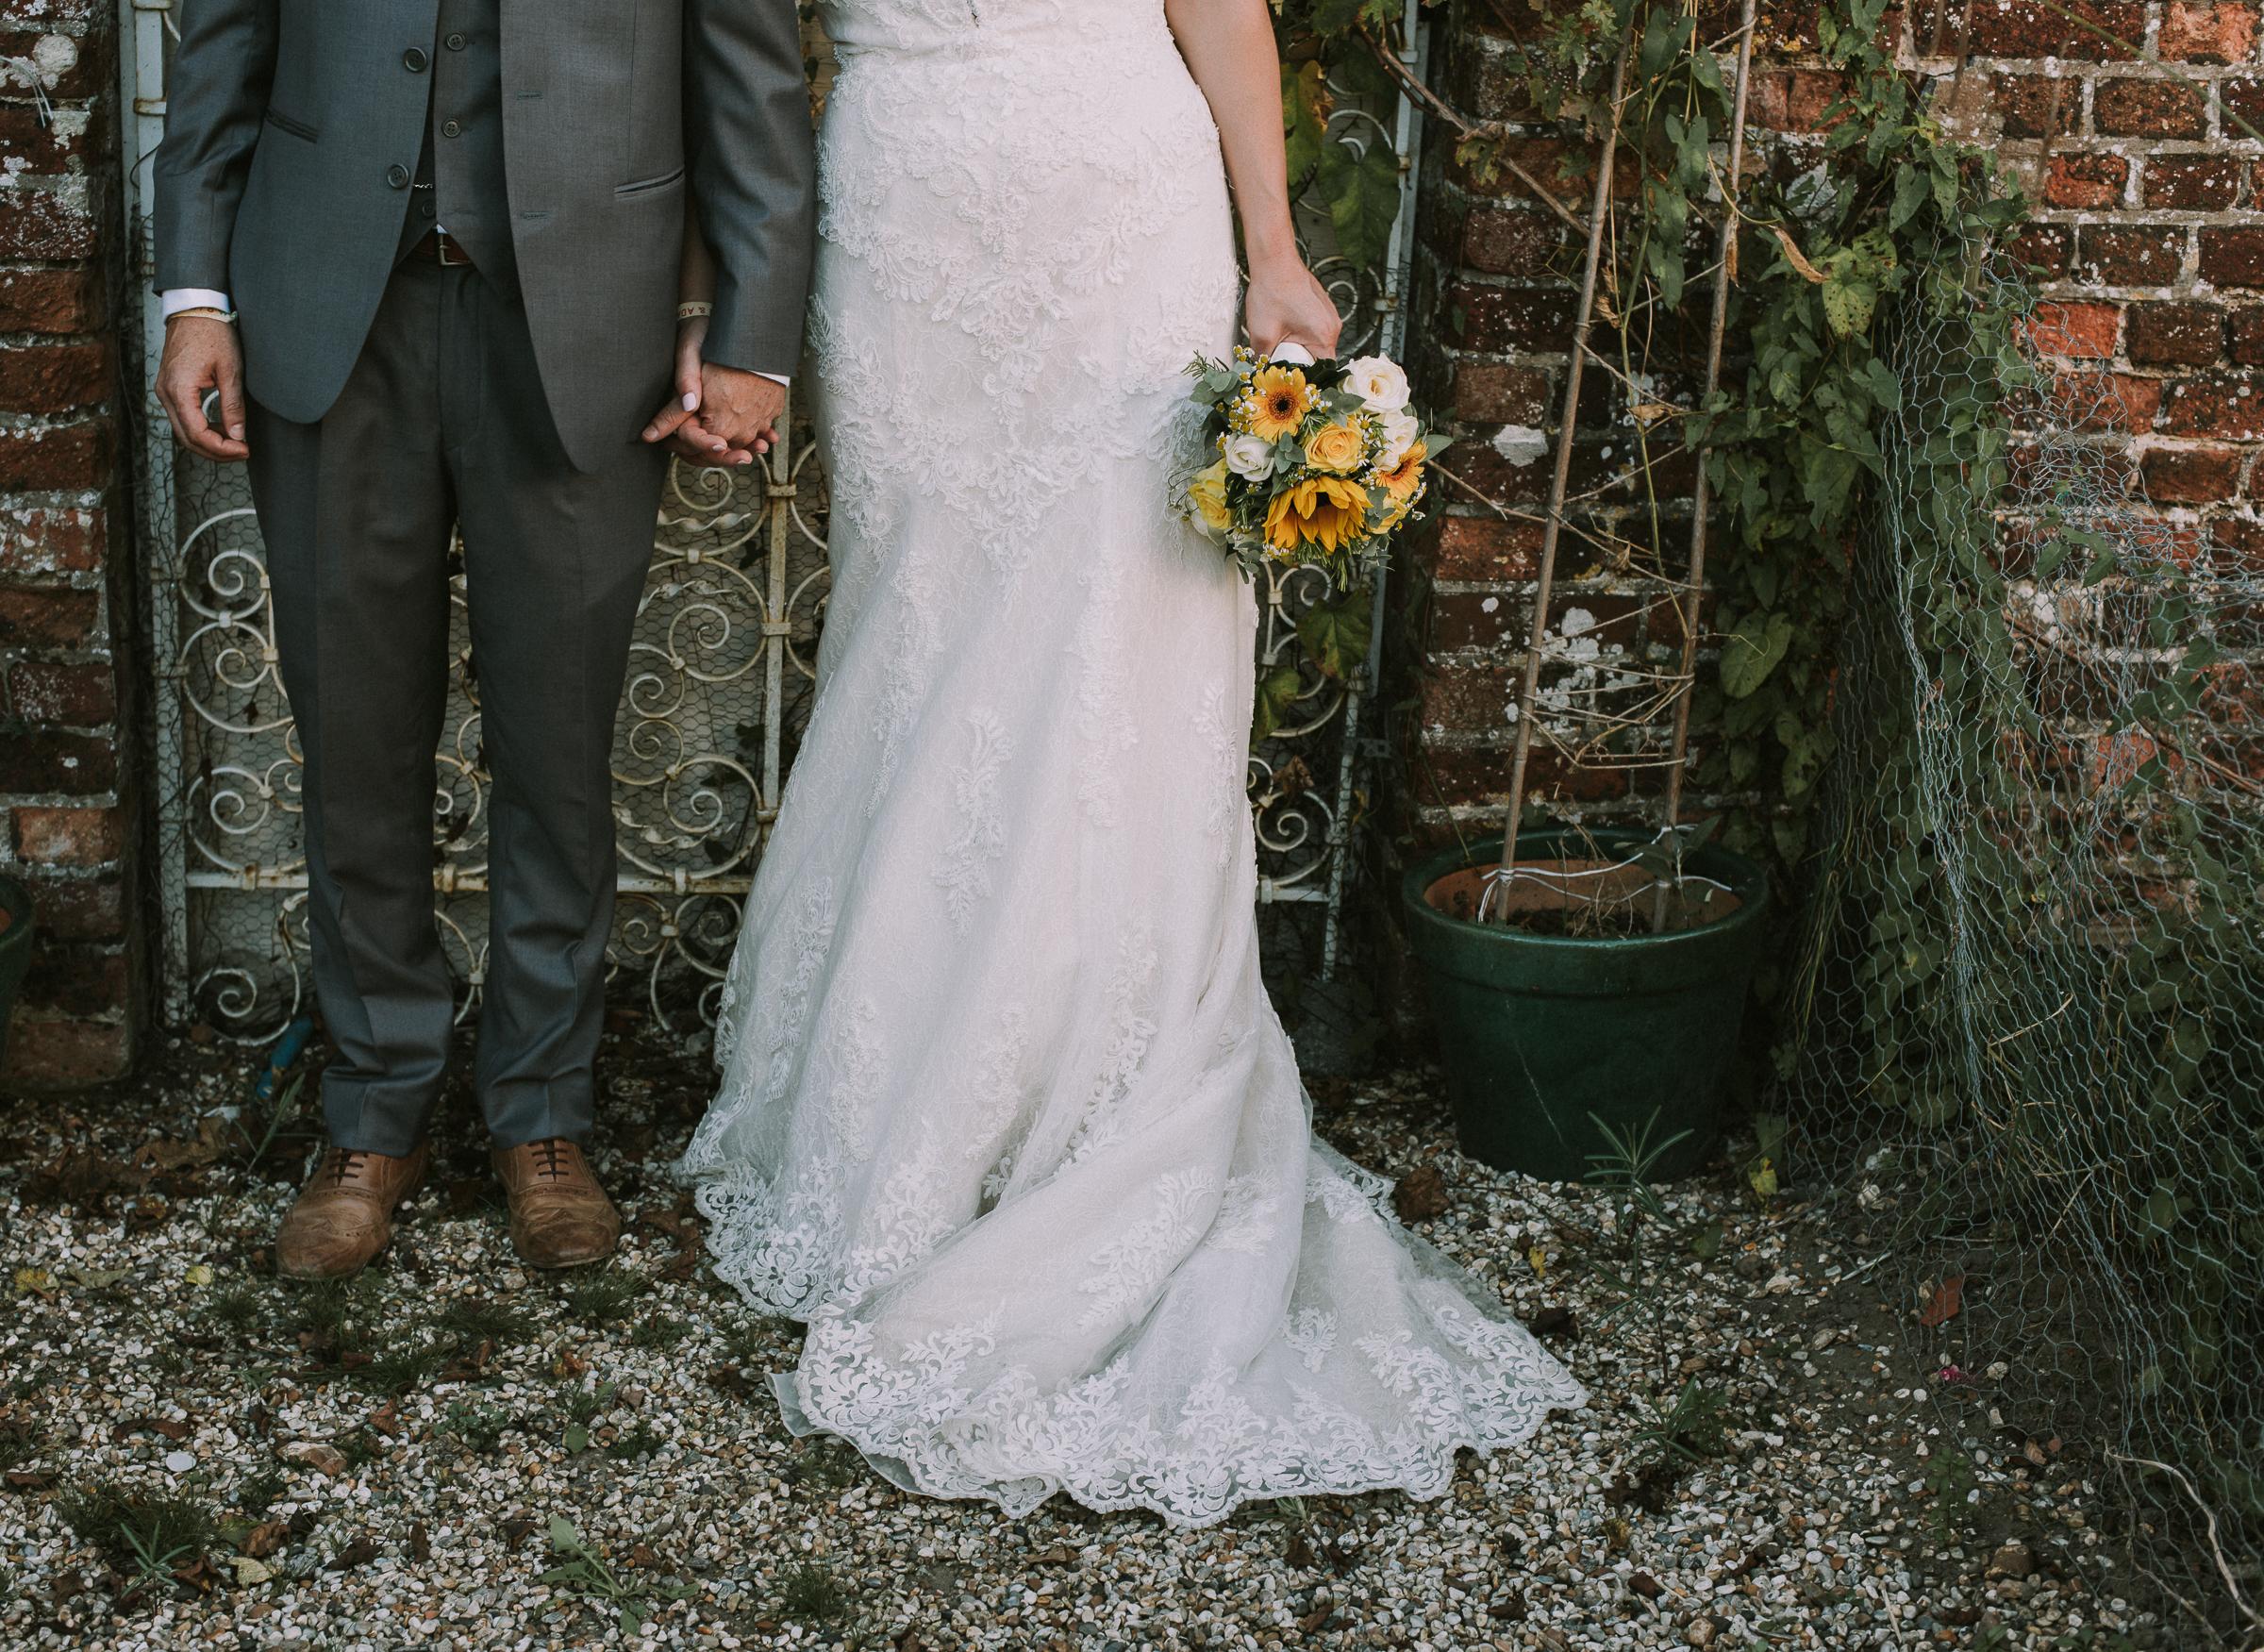 Festival Wedding Photography Secret Garden Maidstone Kent Jay Tunbridge Photorgaphic Co-46.jpg